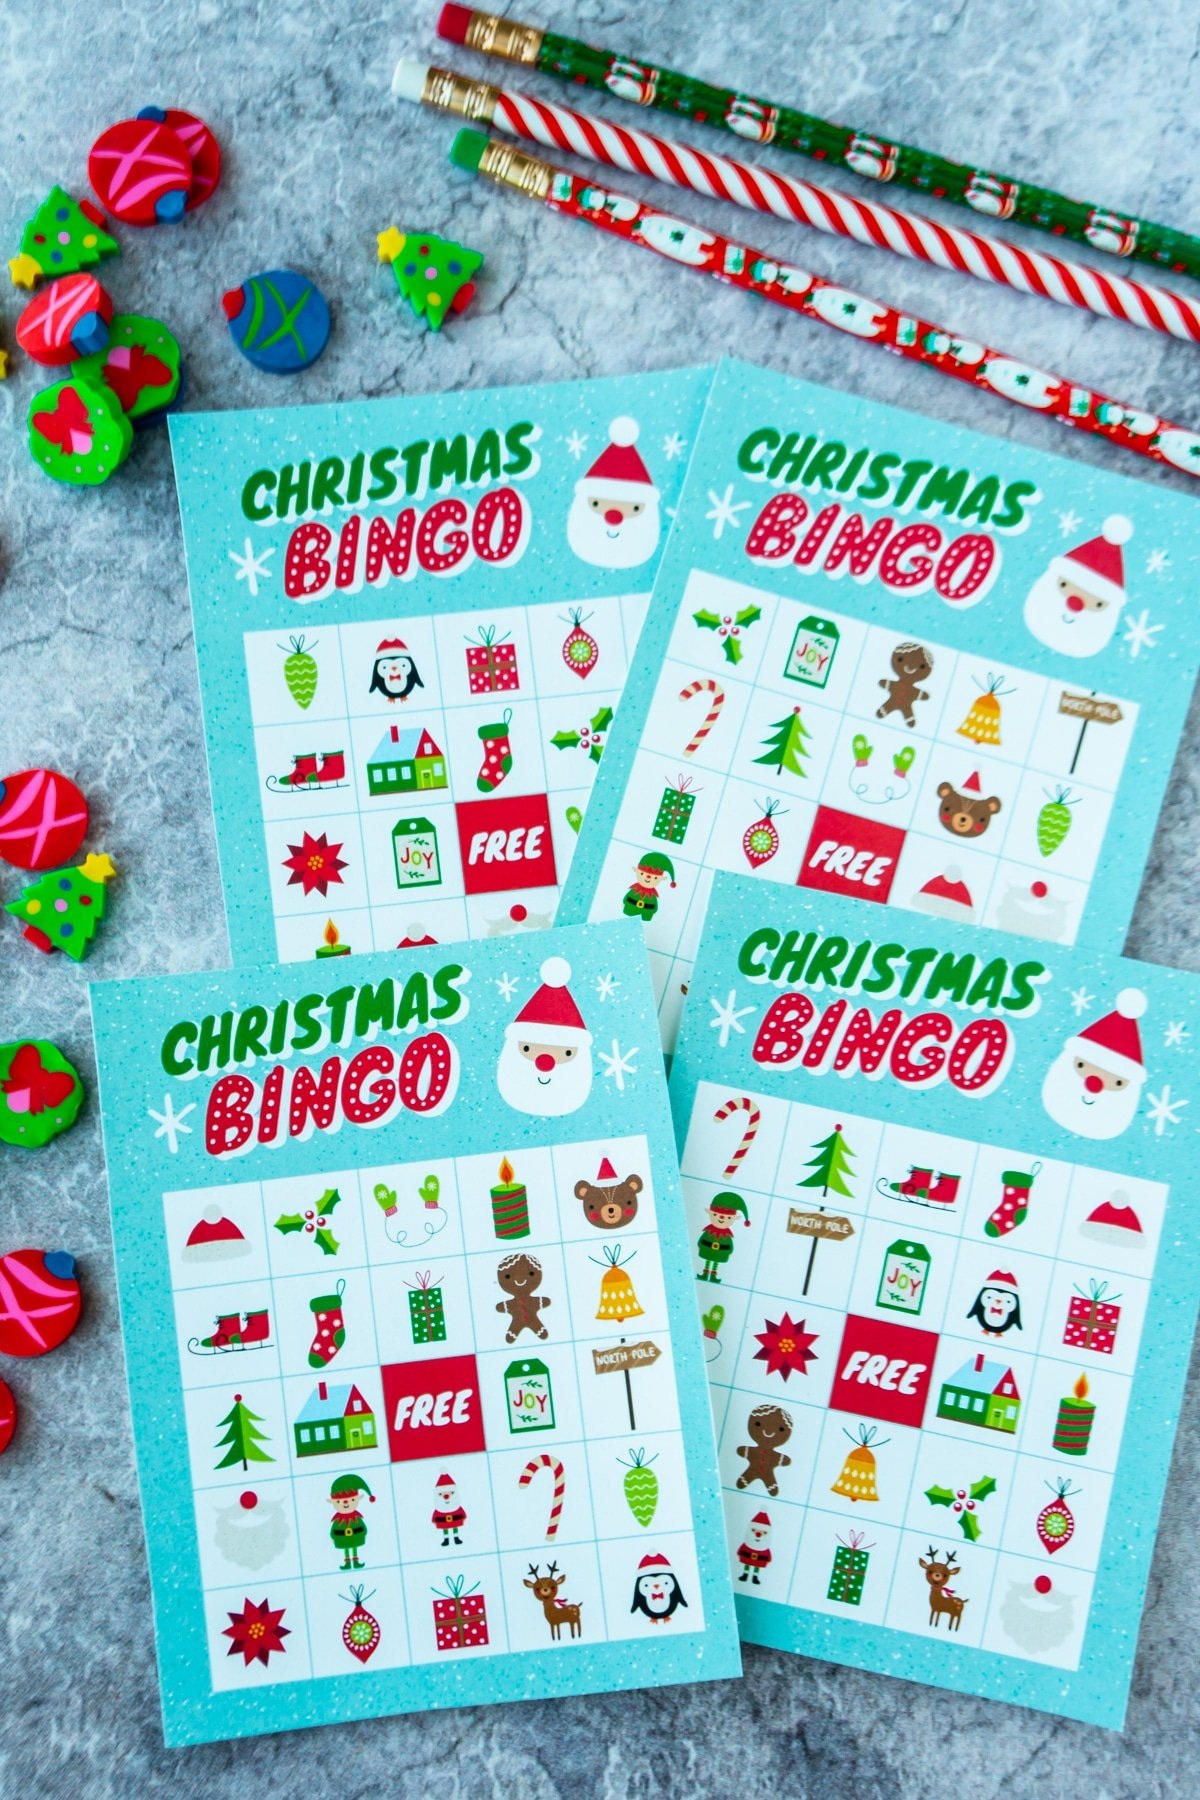 Christmas bingo cards with Christmas erasers around